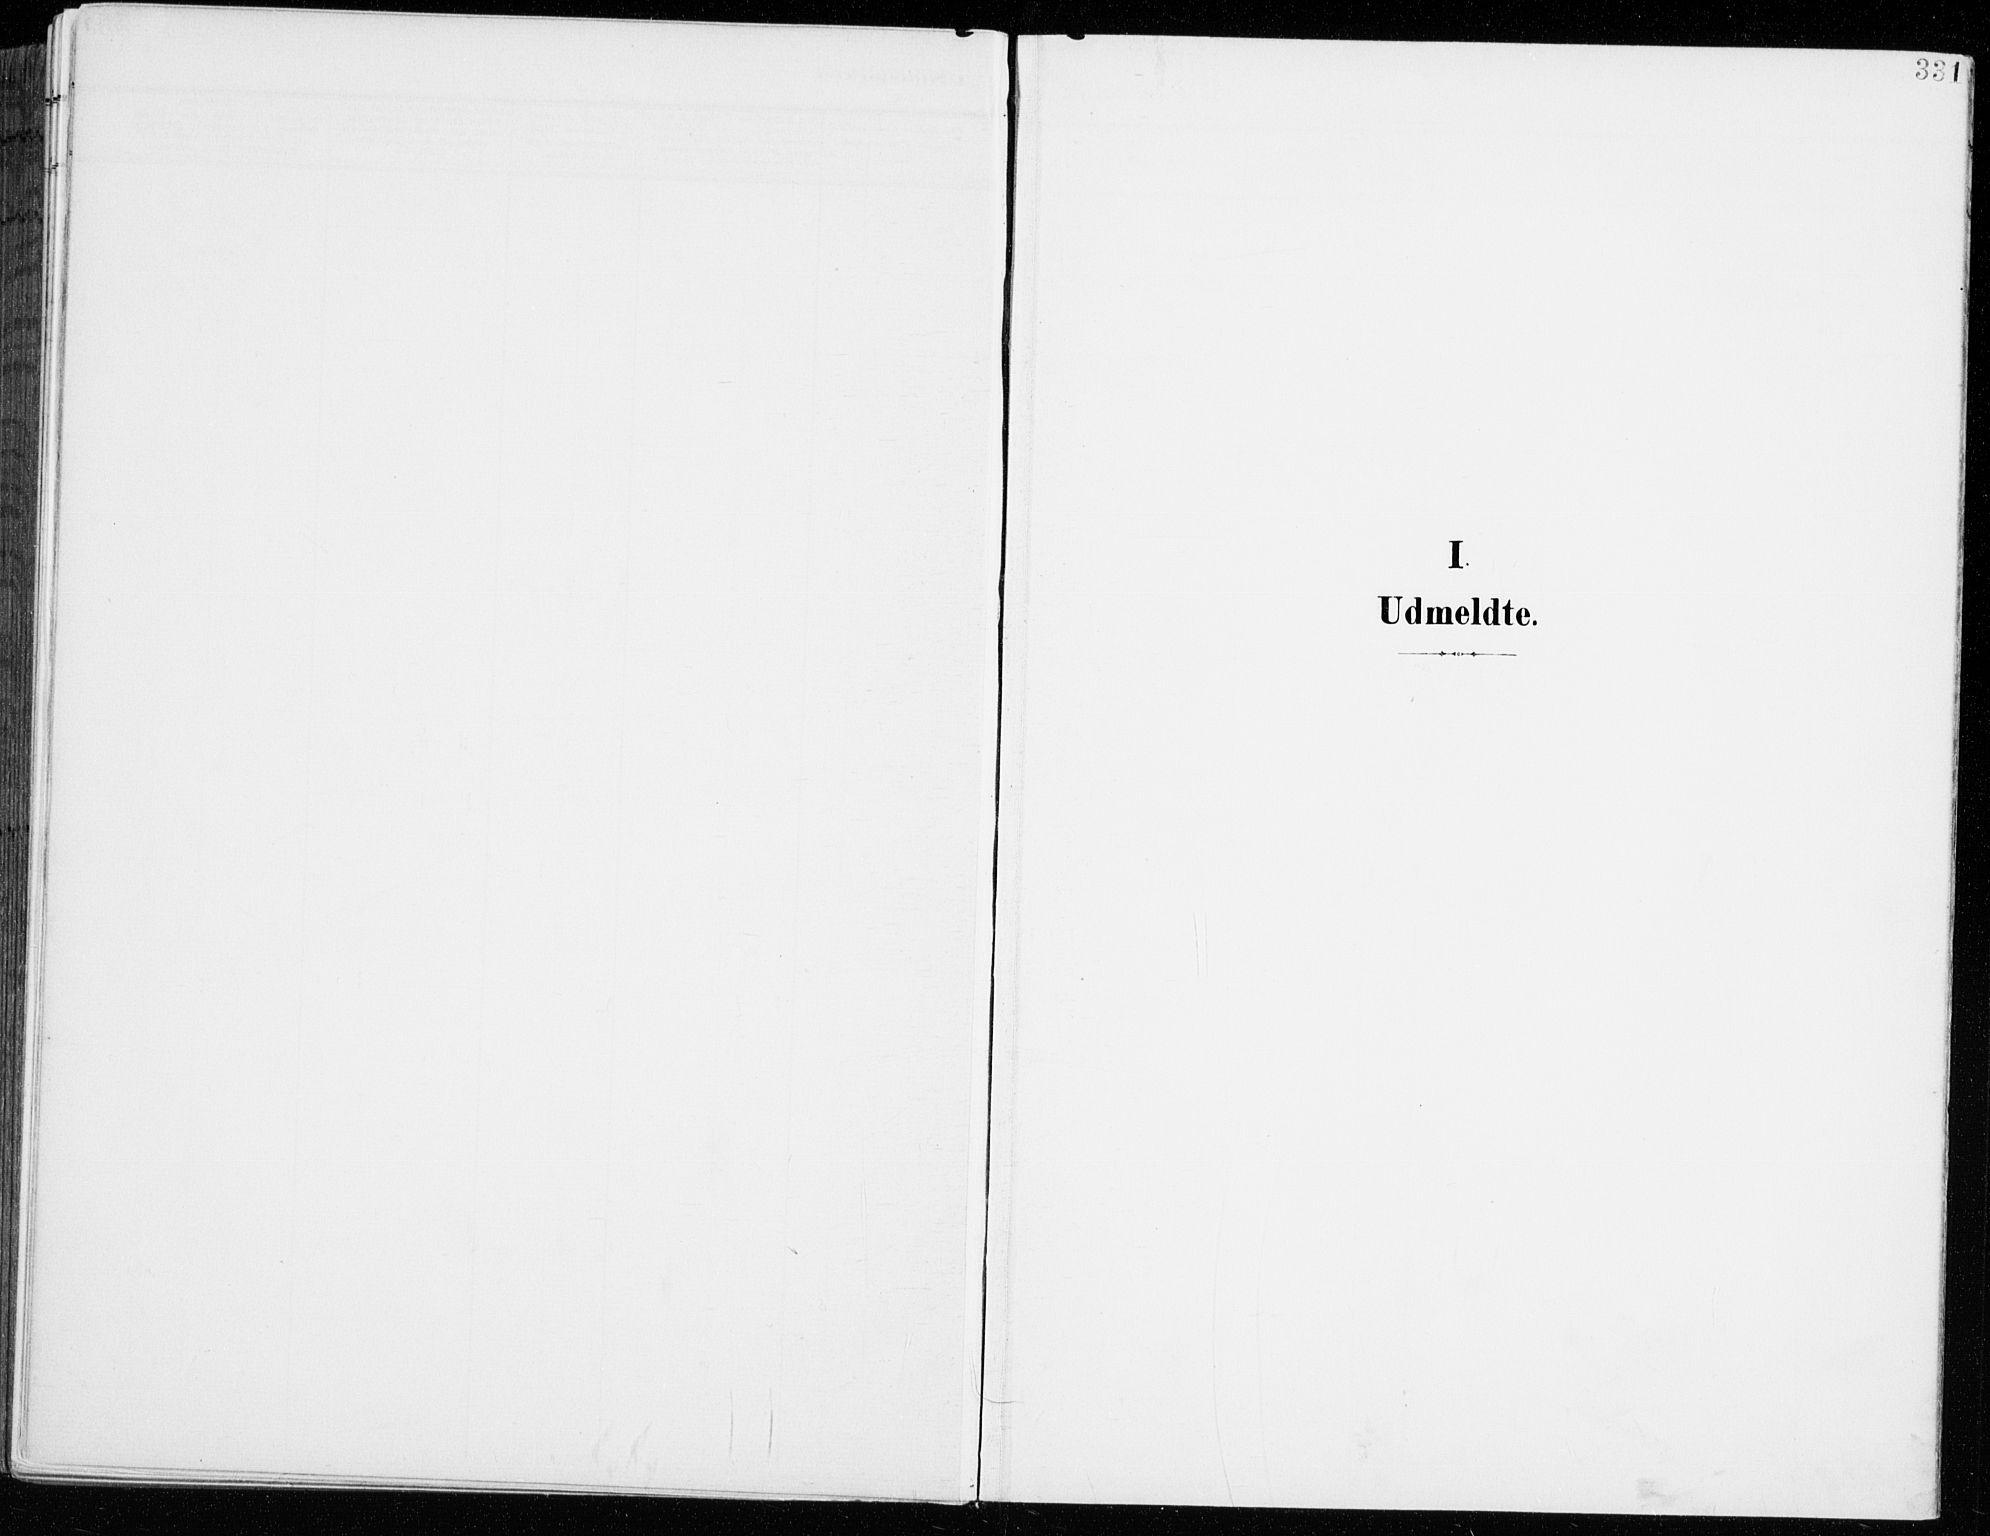 SAH, Fåberg prestekontor, H/Ha/Haa/L0011: Parish register (official) no. 11, 1899-1913, p. 331